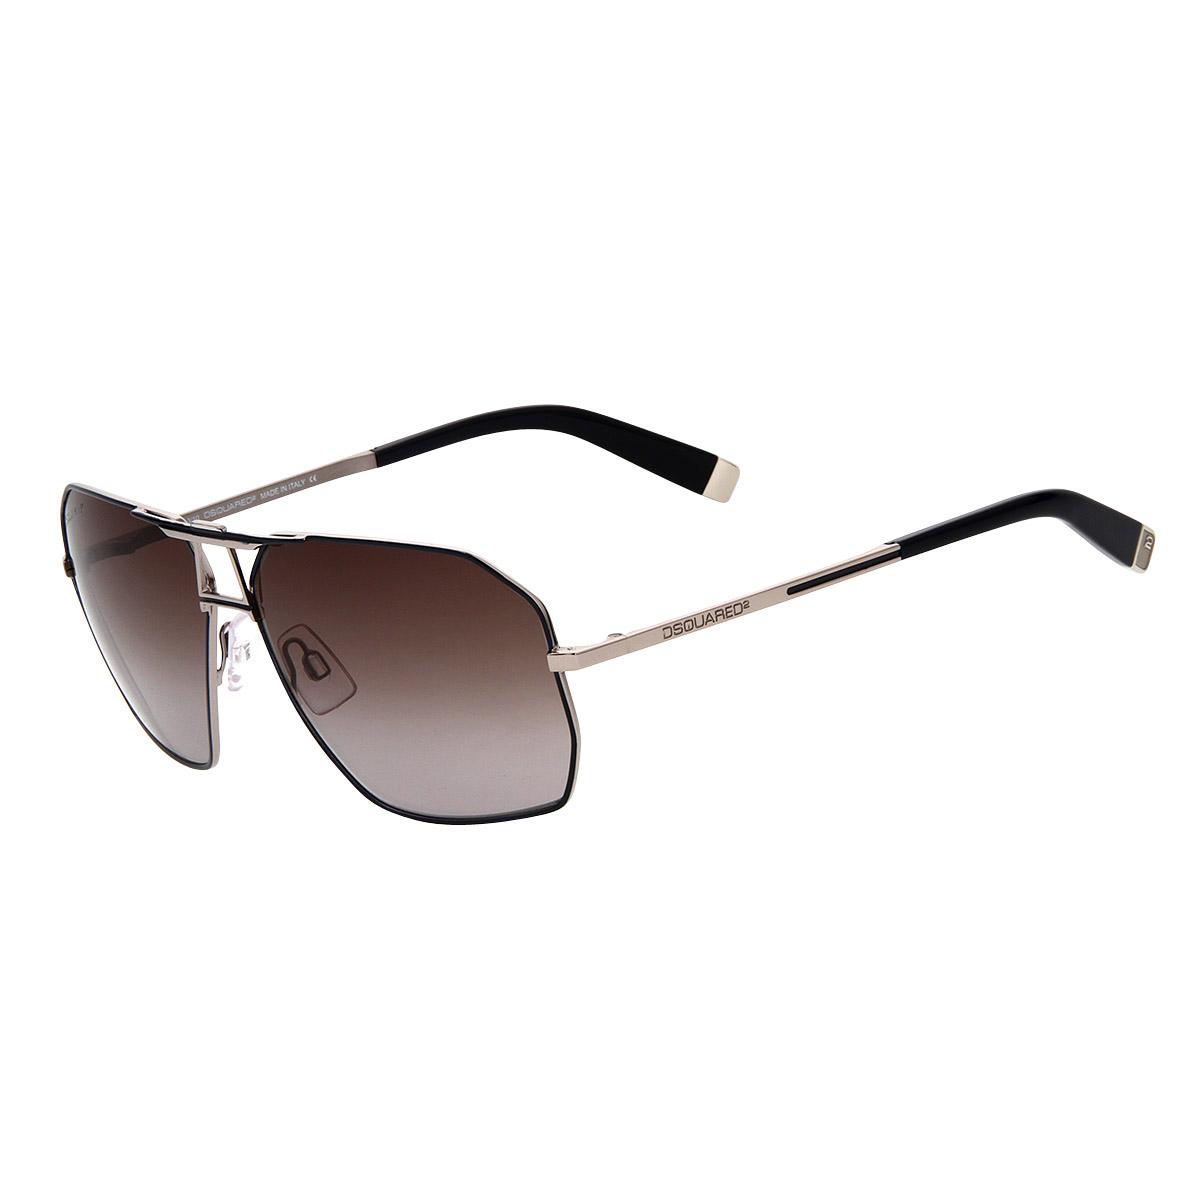 d7595fddb25 Dsquared Sunglasses Ebay « Heritage Malta